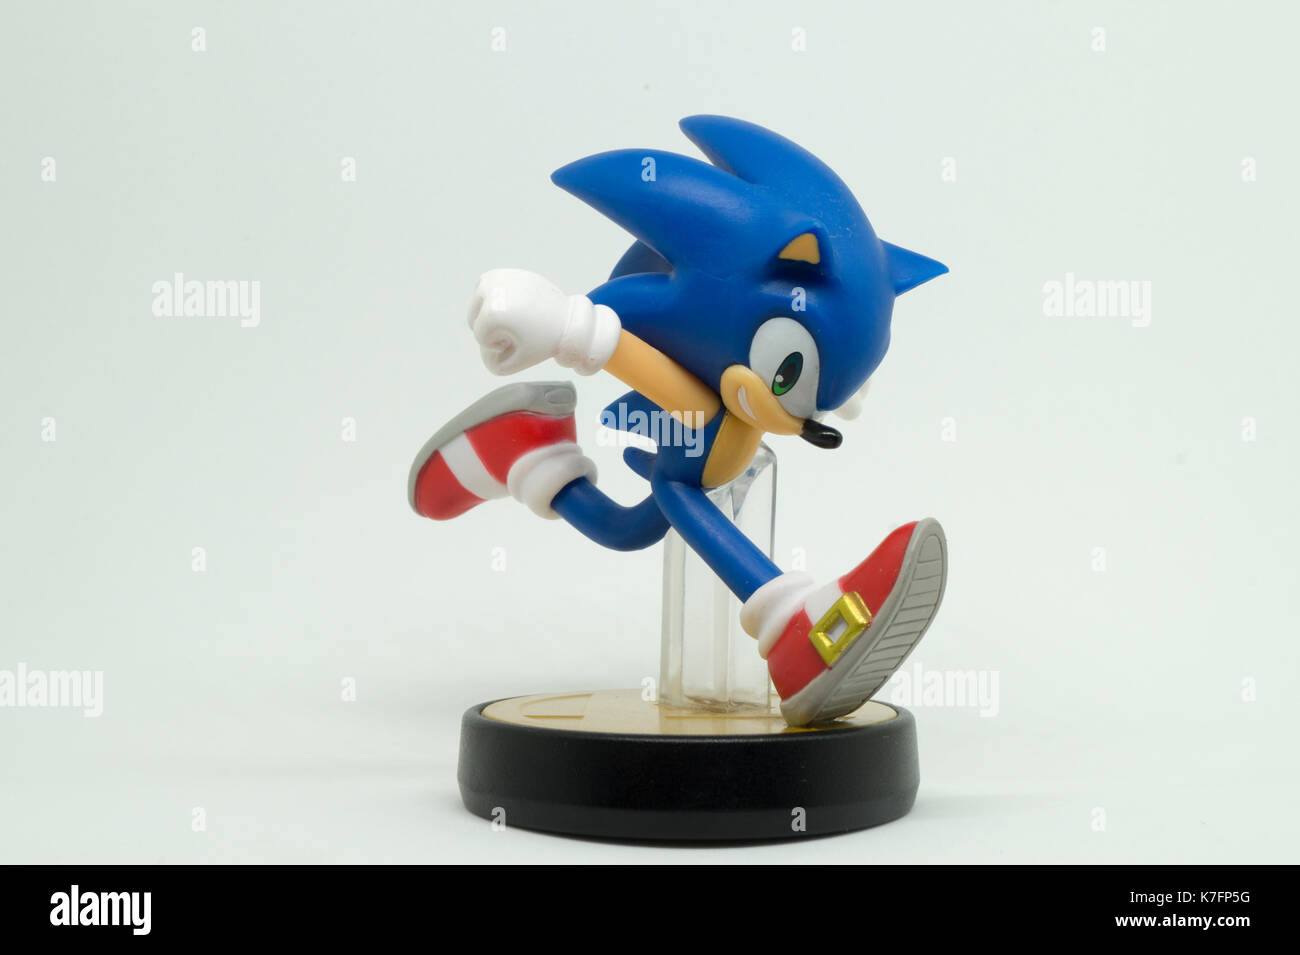 Nintendo Super Smash Bros Amiibo Sammlung Abbildung Sonic Stockfotografie Alamy